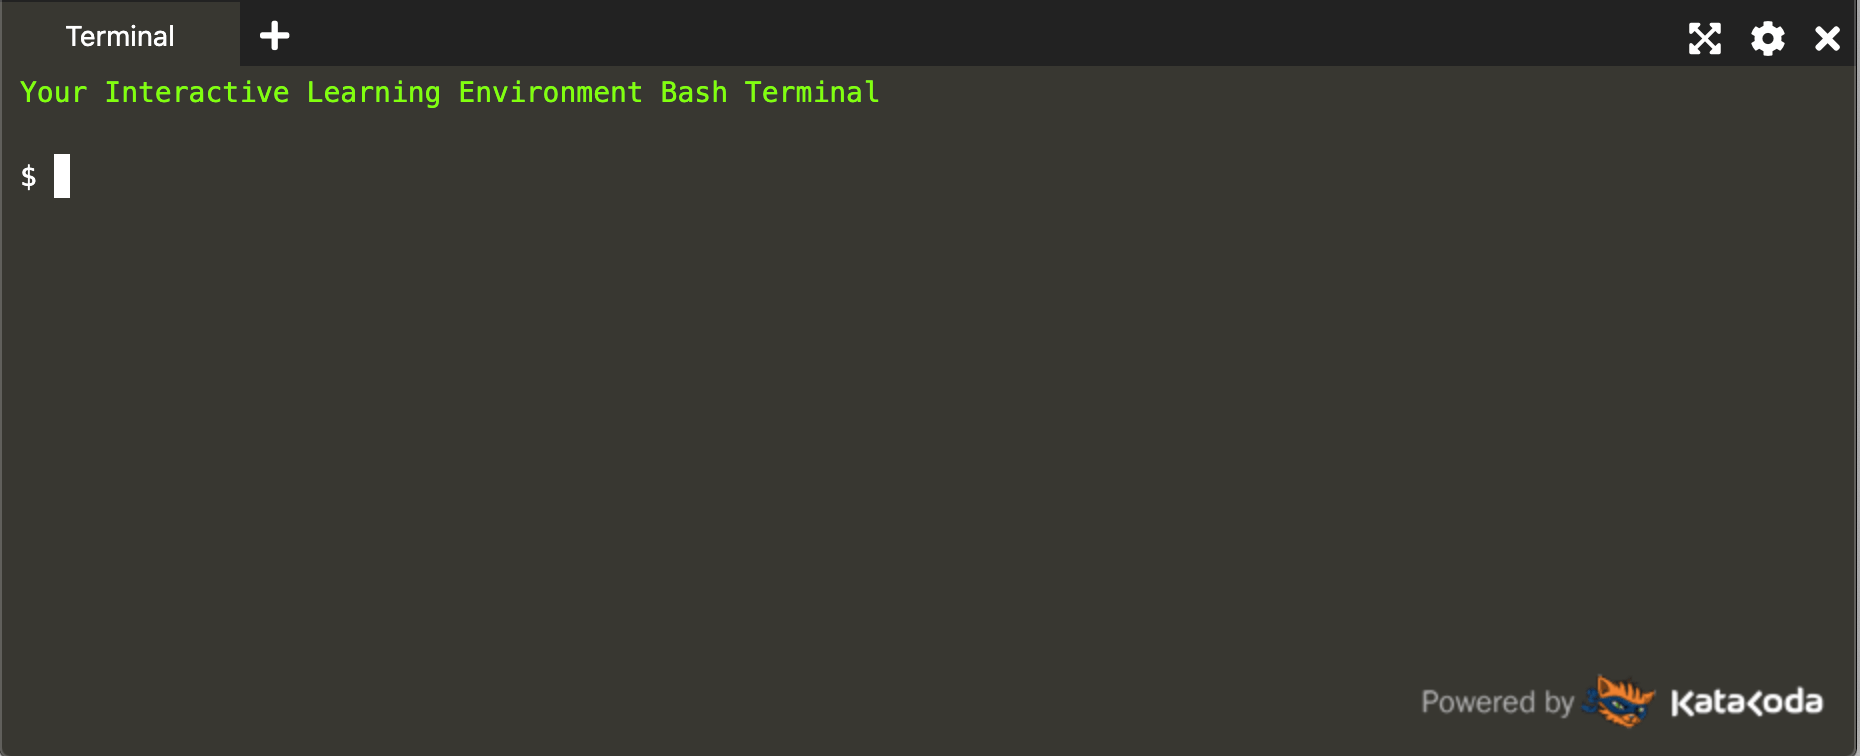 Screenshot of the Katacoda Terminal Environment